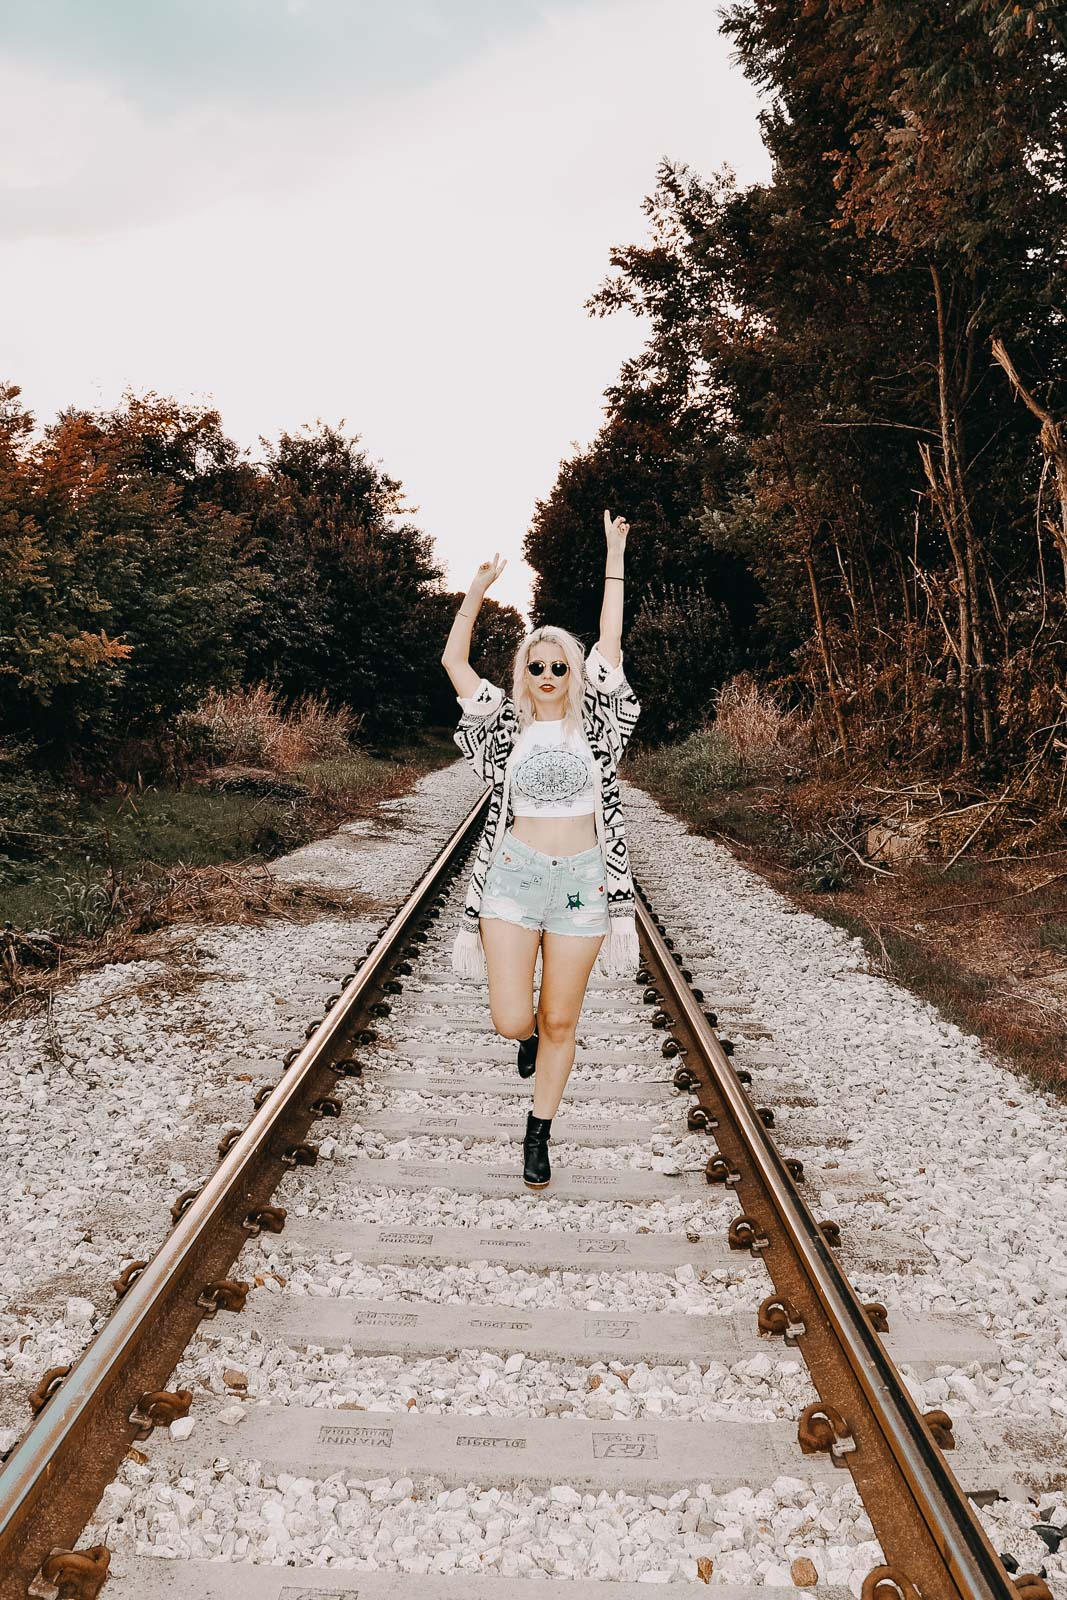 my journey to self awakening 35mminstyle